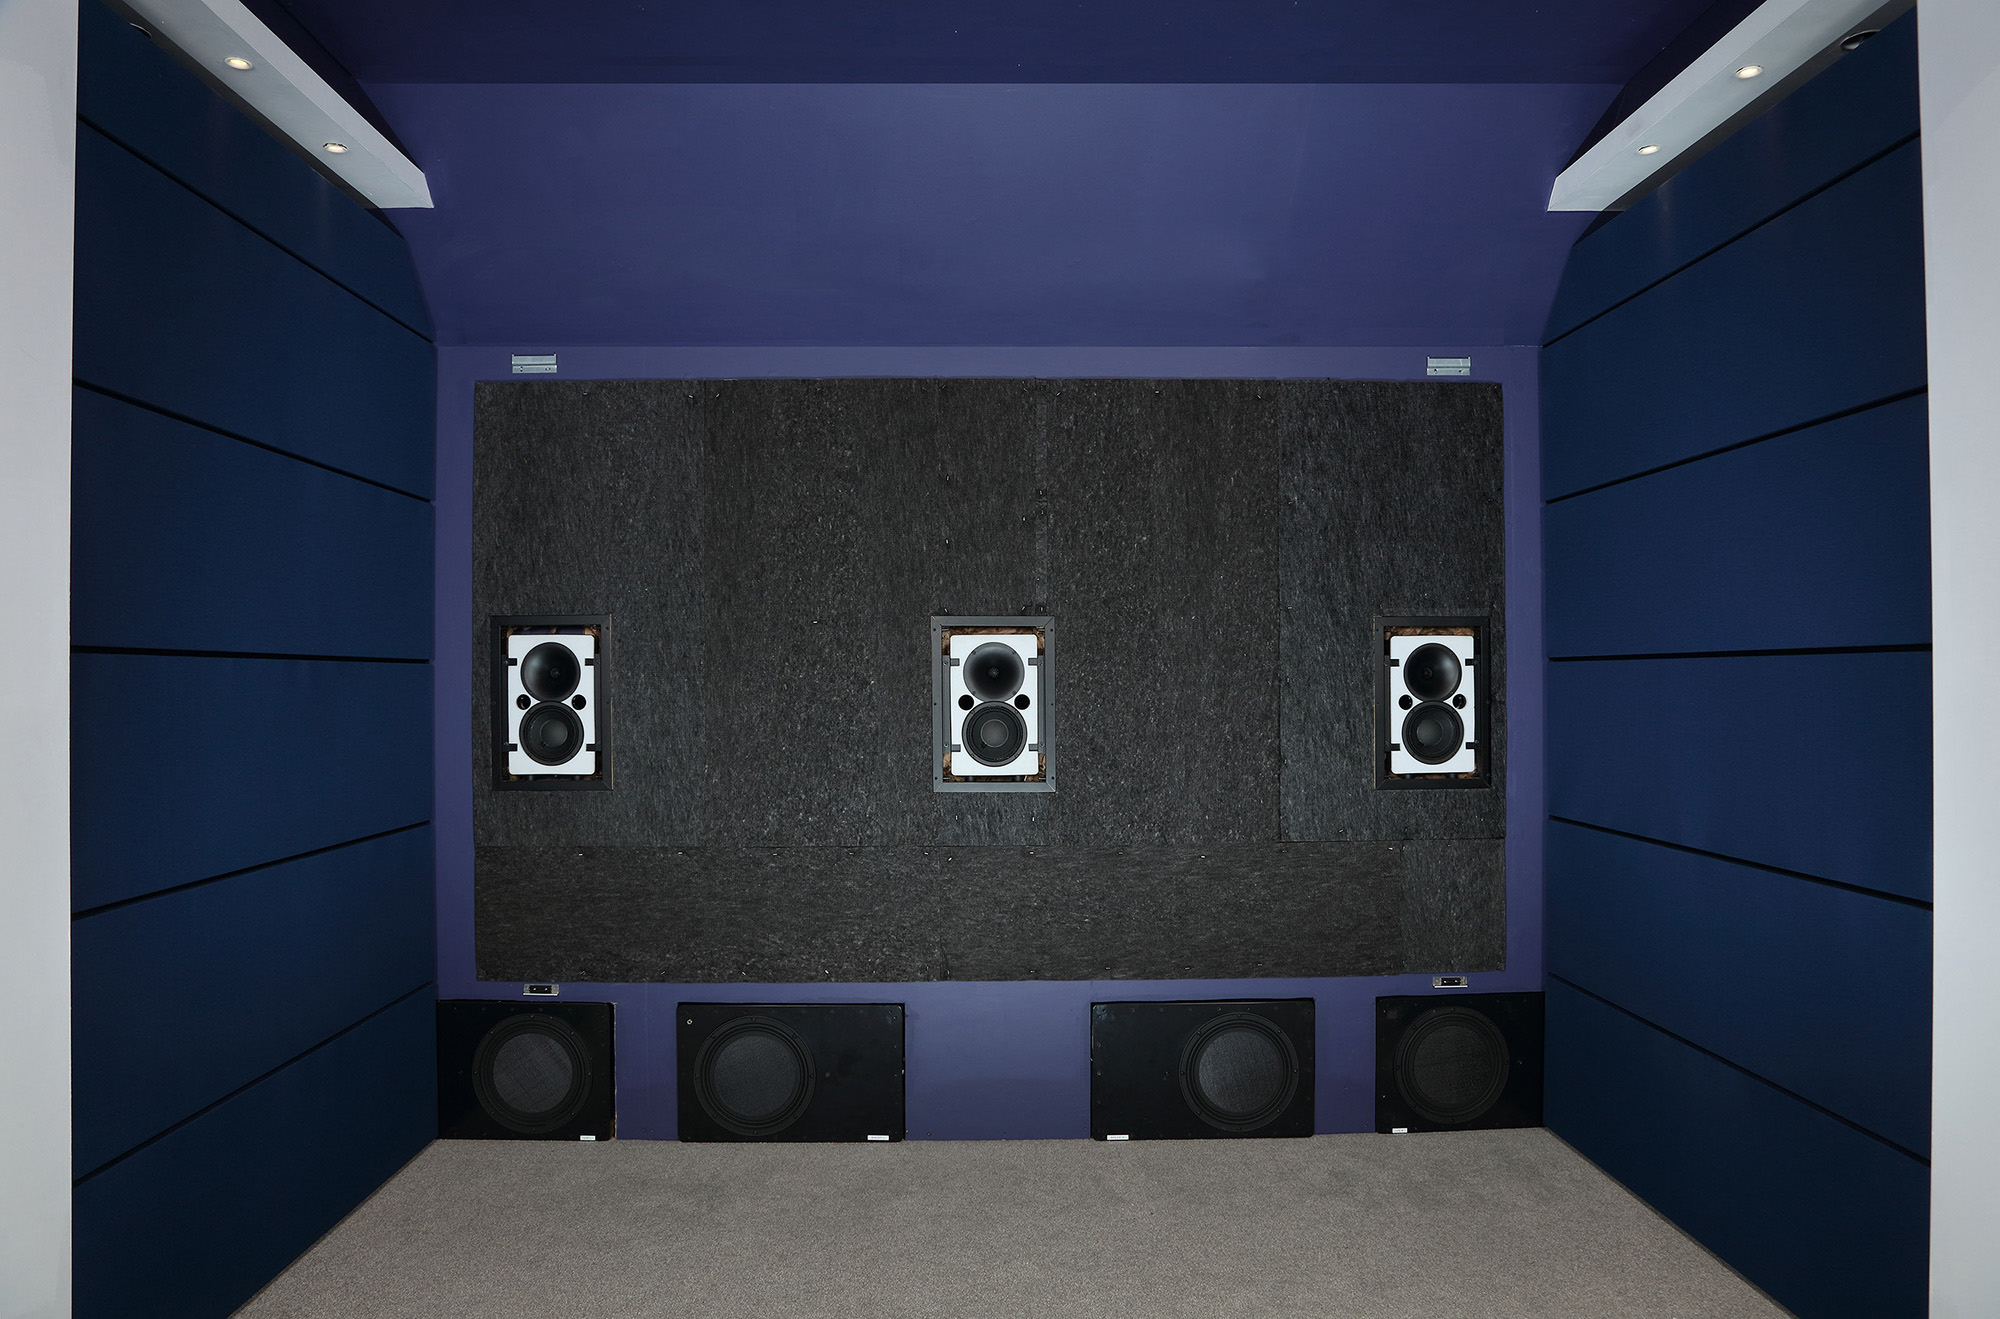 Oppo blu ray player newegg